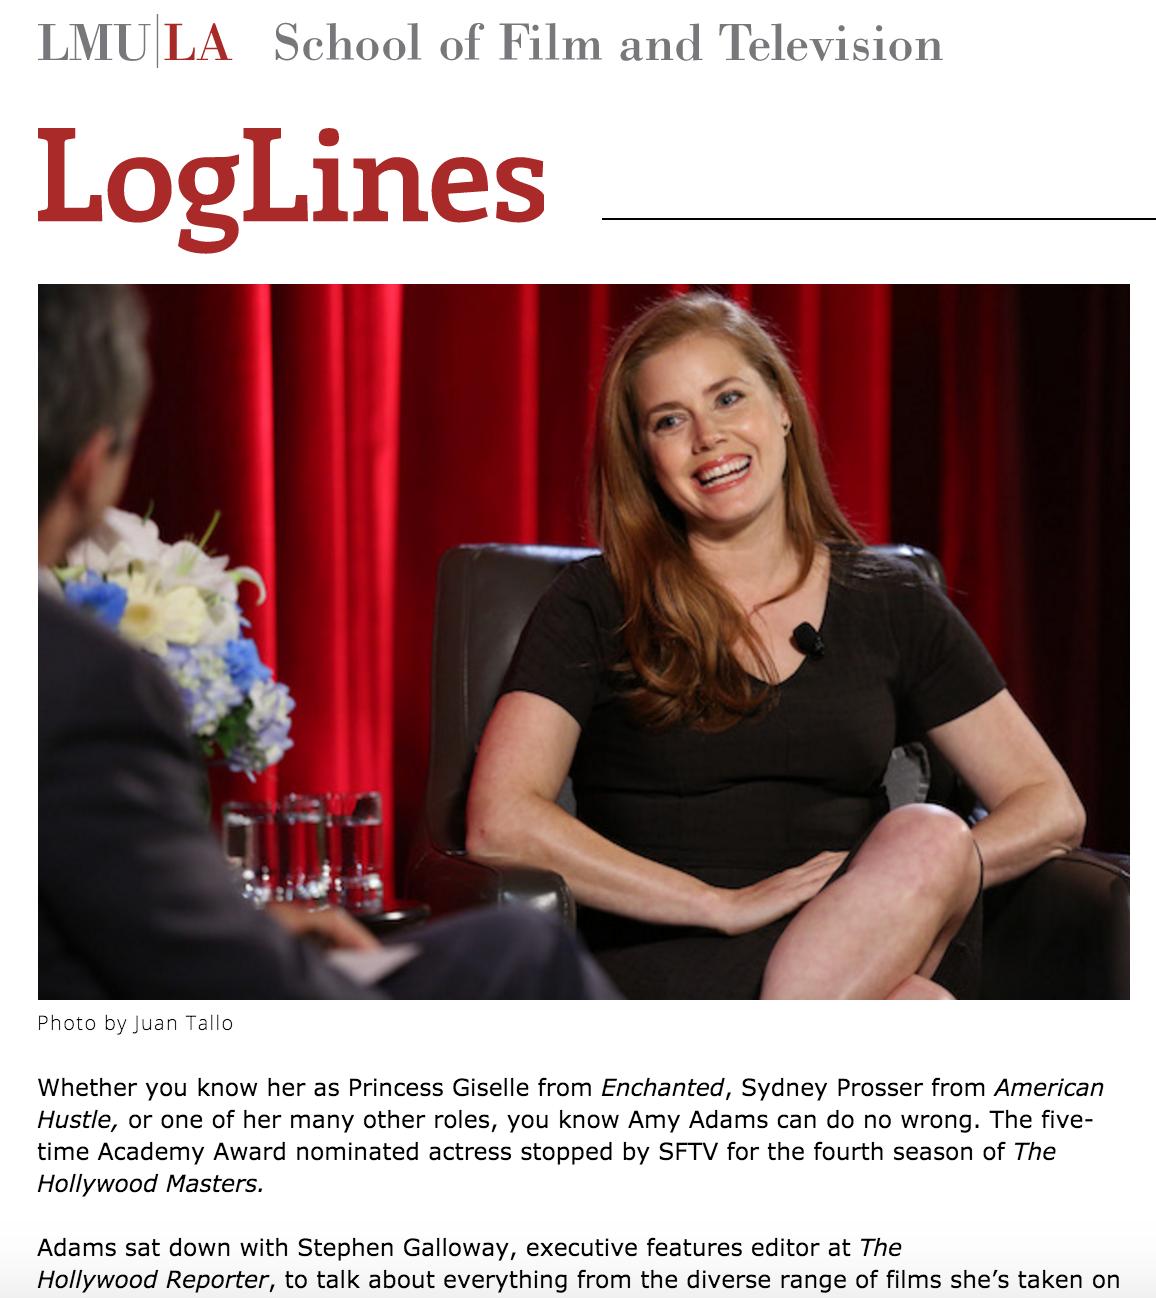 """The Hollywood Master: Amy Adams"" /Amanda Lopez   Loglines"